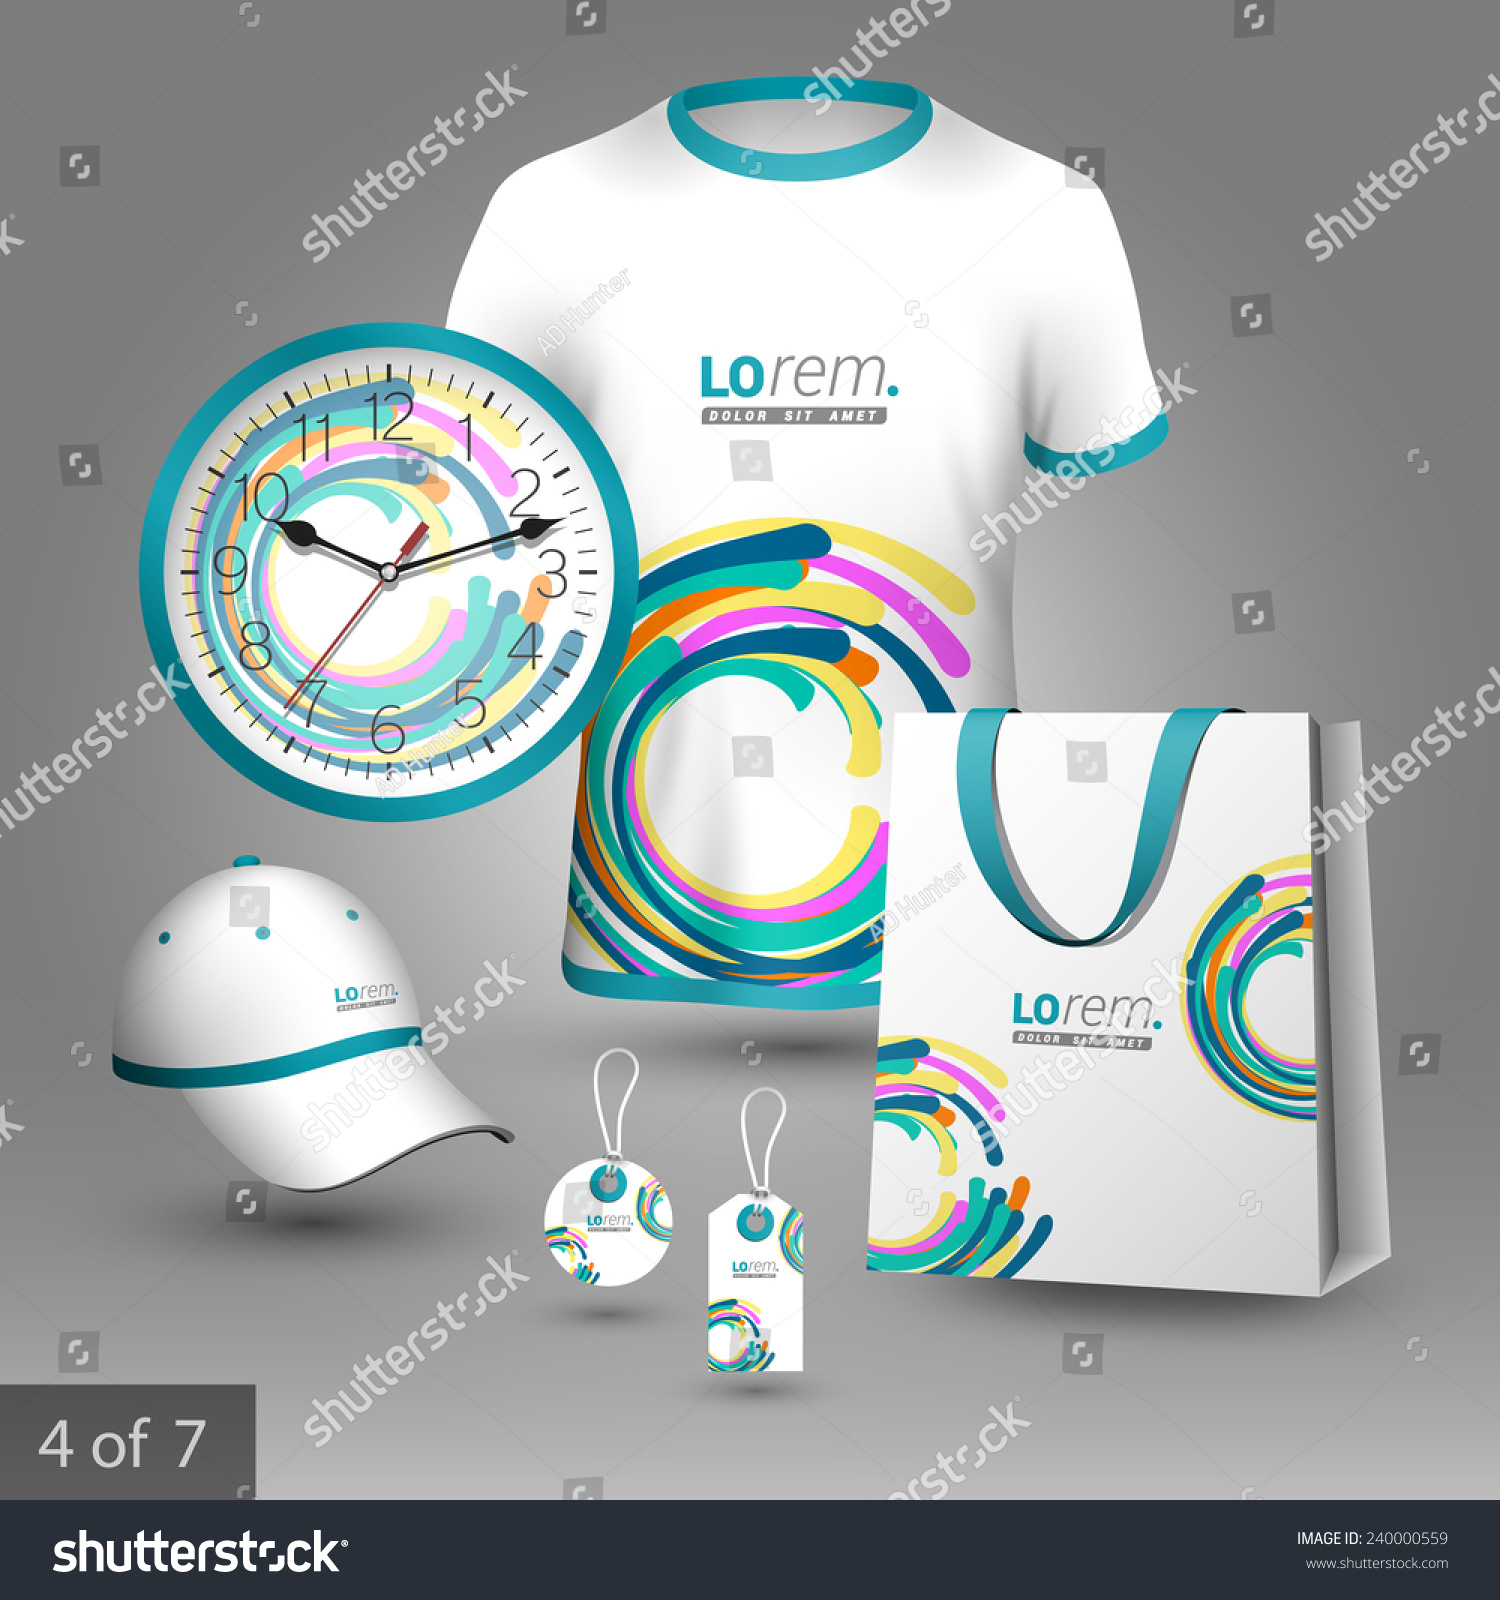 Colorful Promotional Souvenirs Design Company Circles Stock Vector